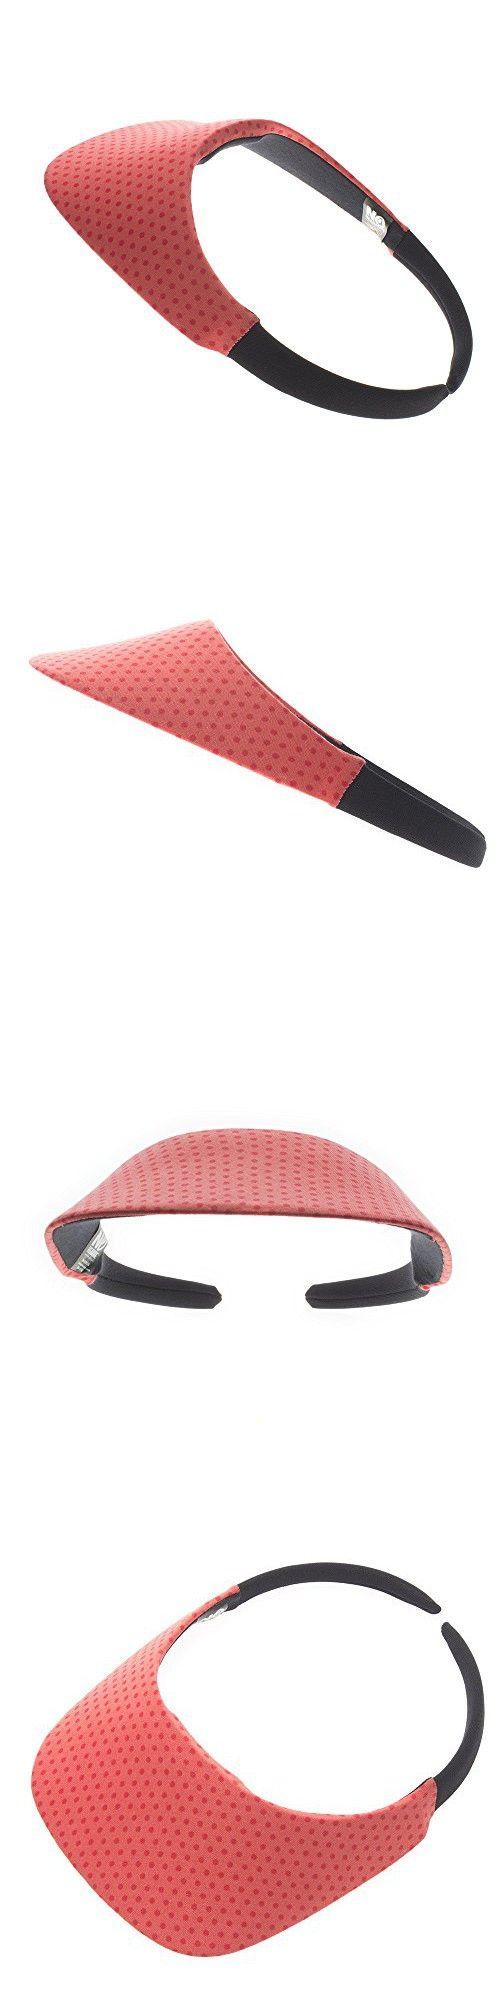 "The ""Original"" No Headache Womens Sun Visor Hat (Coral Dot)"